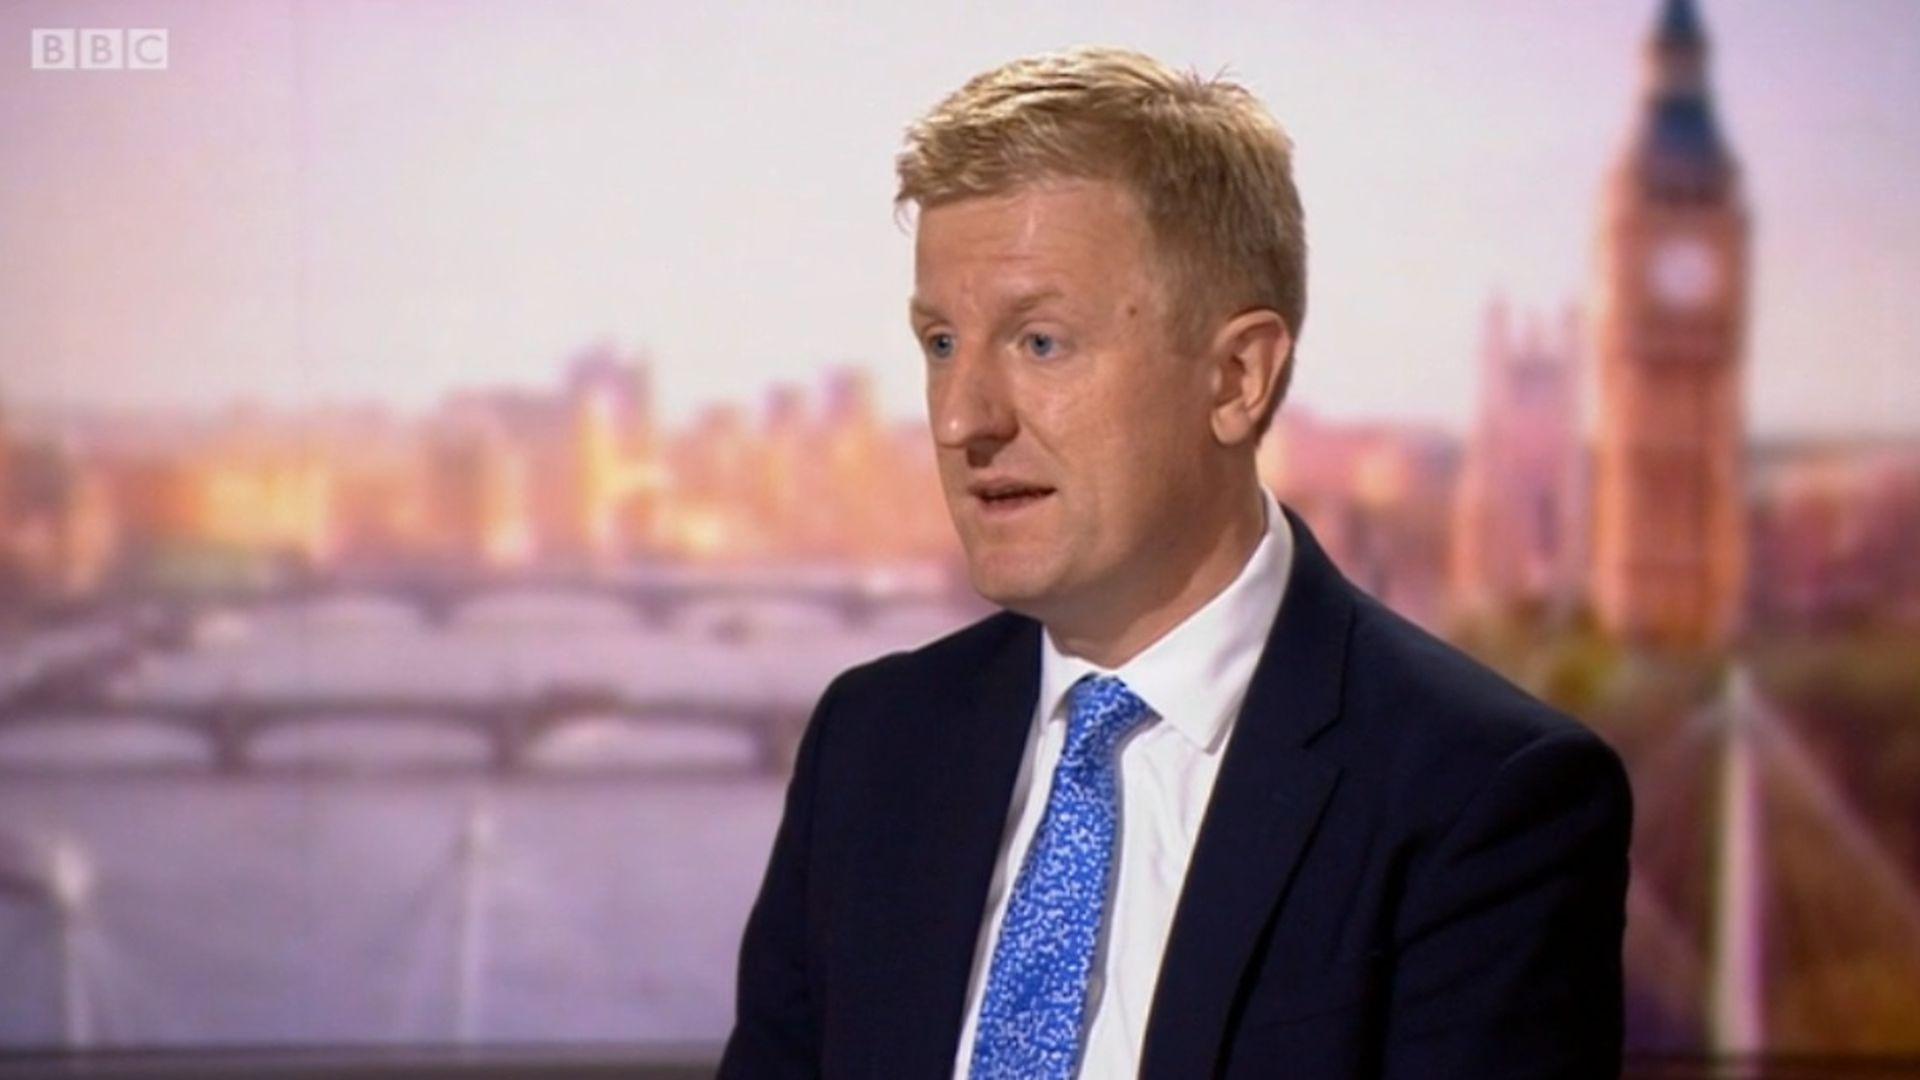 Culture secretary Oliver Dowden - Credit: Andrew Marr Show/BBC